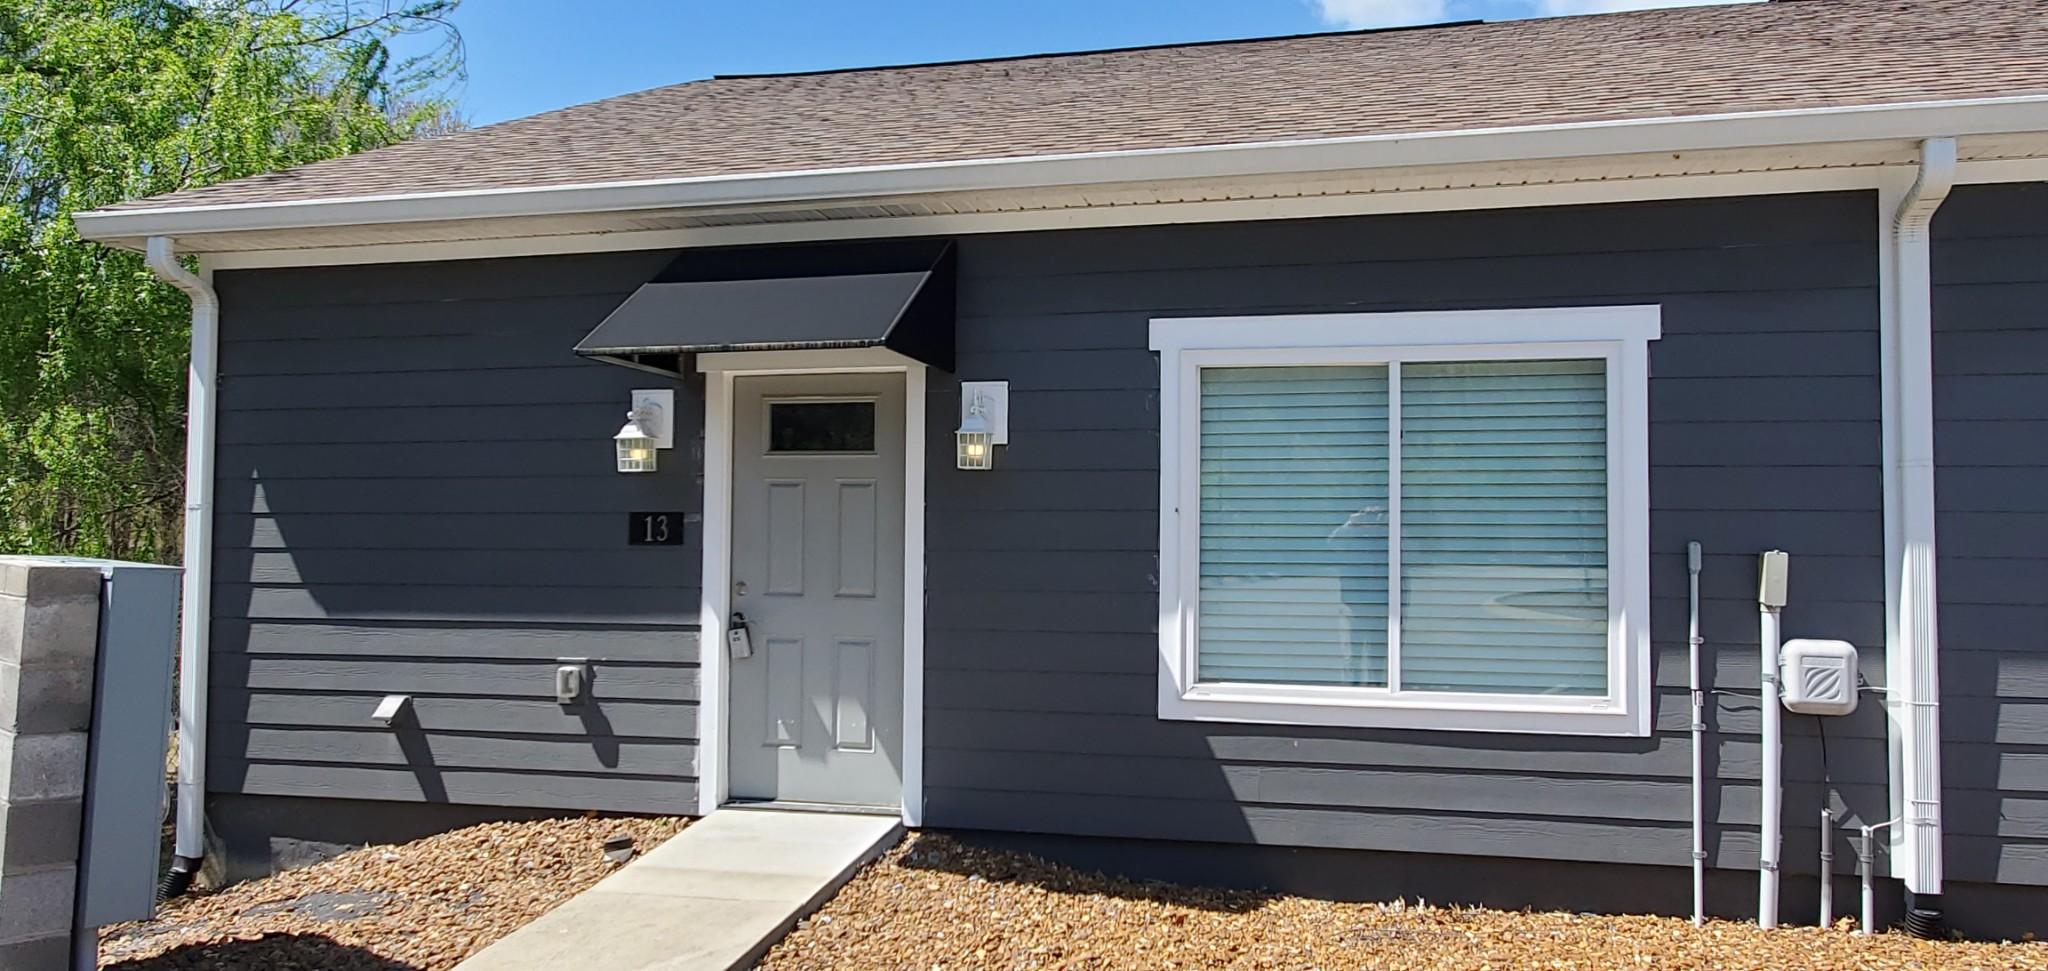 155 Bell Rd #13 Property Photo - Nashville, TN real estate listing